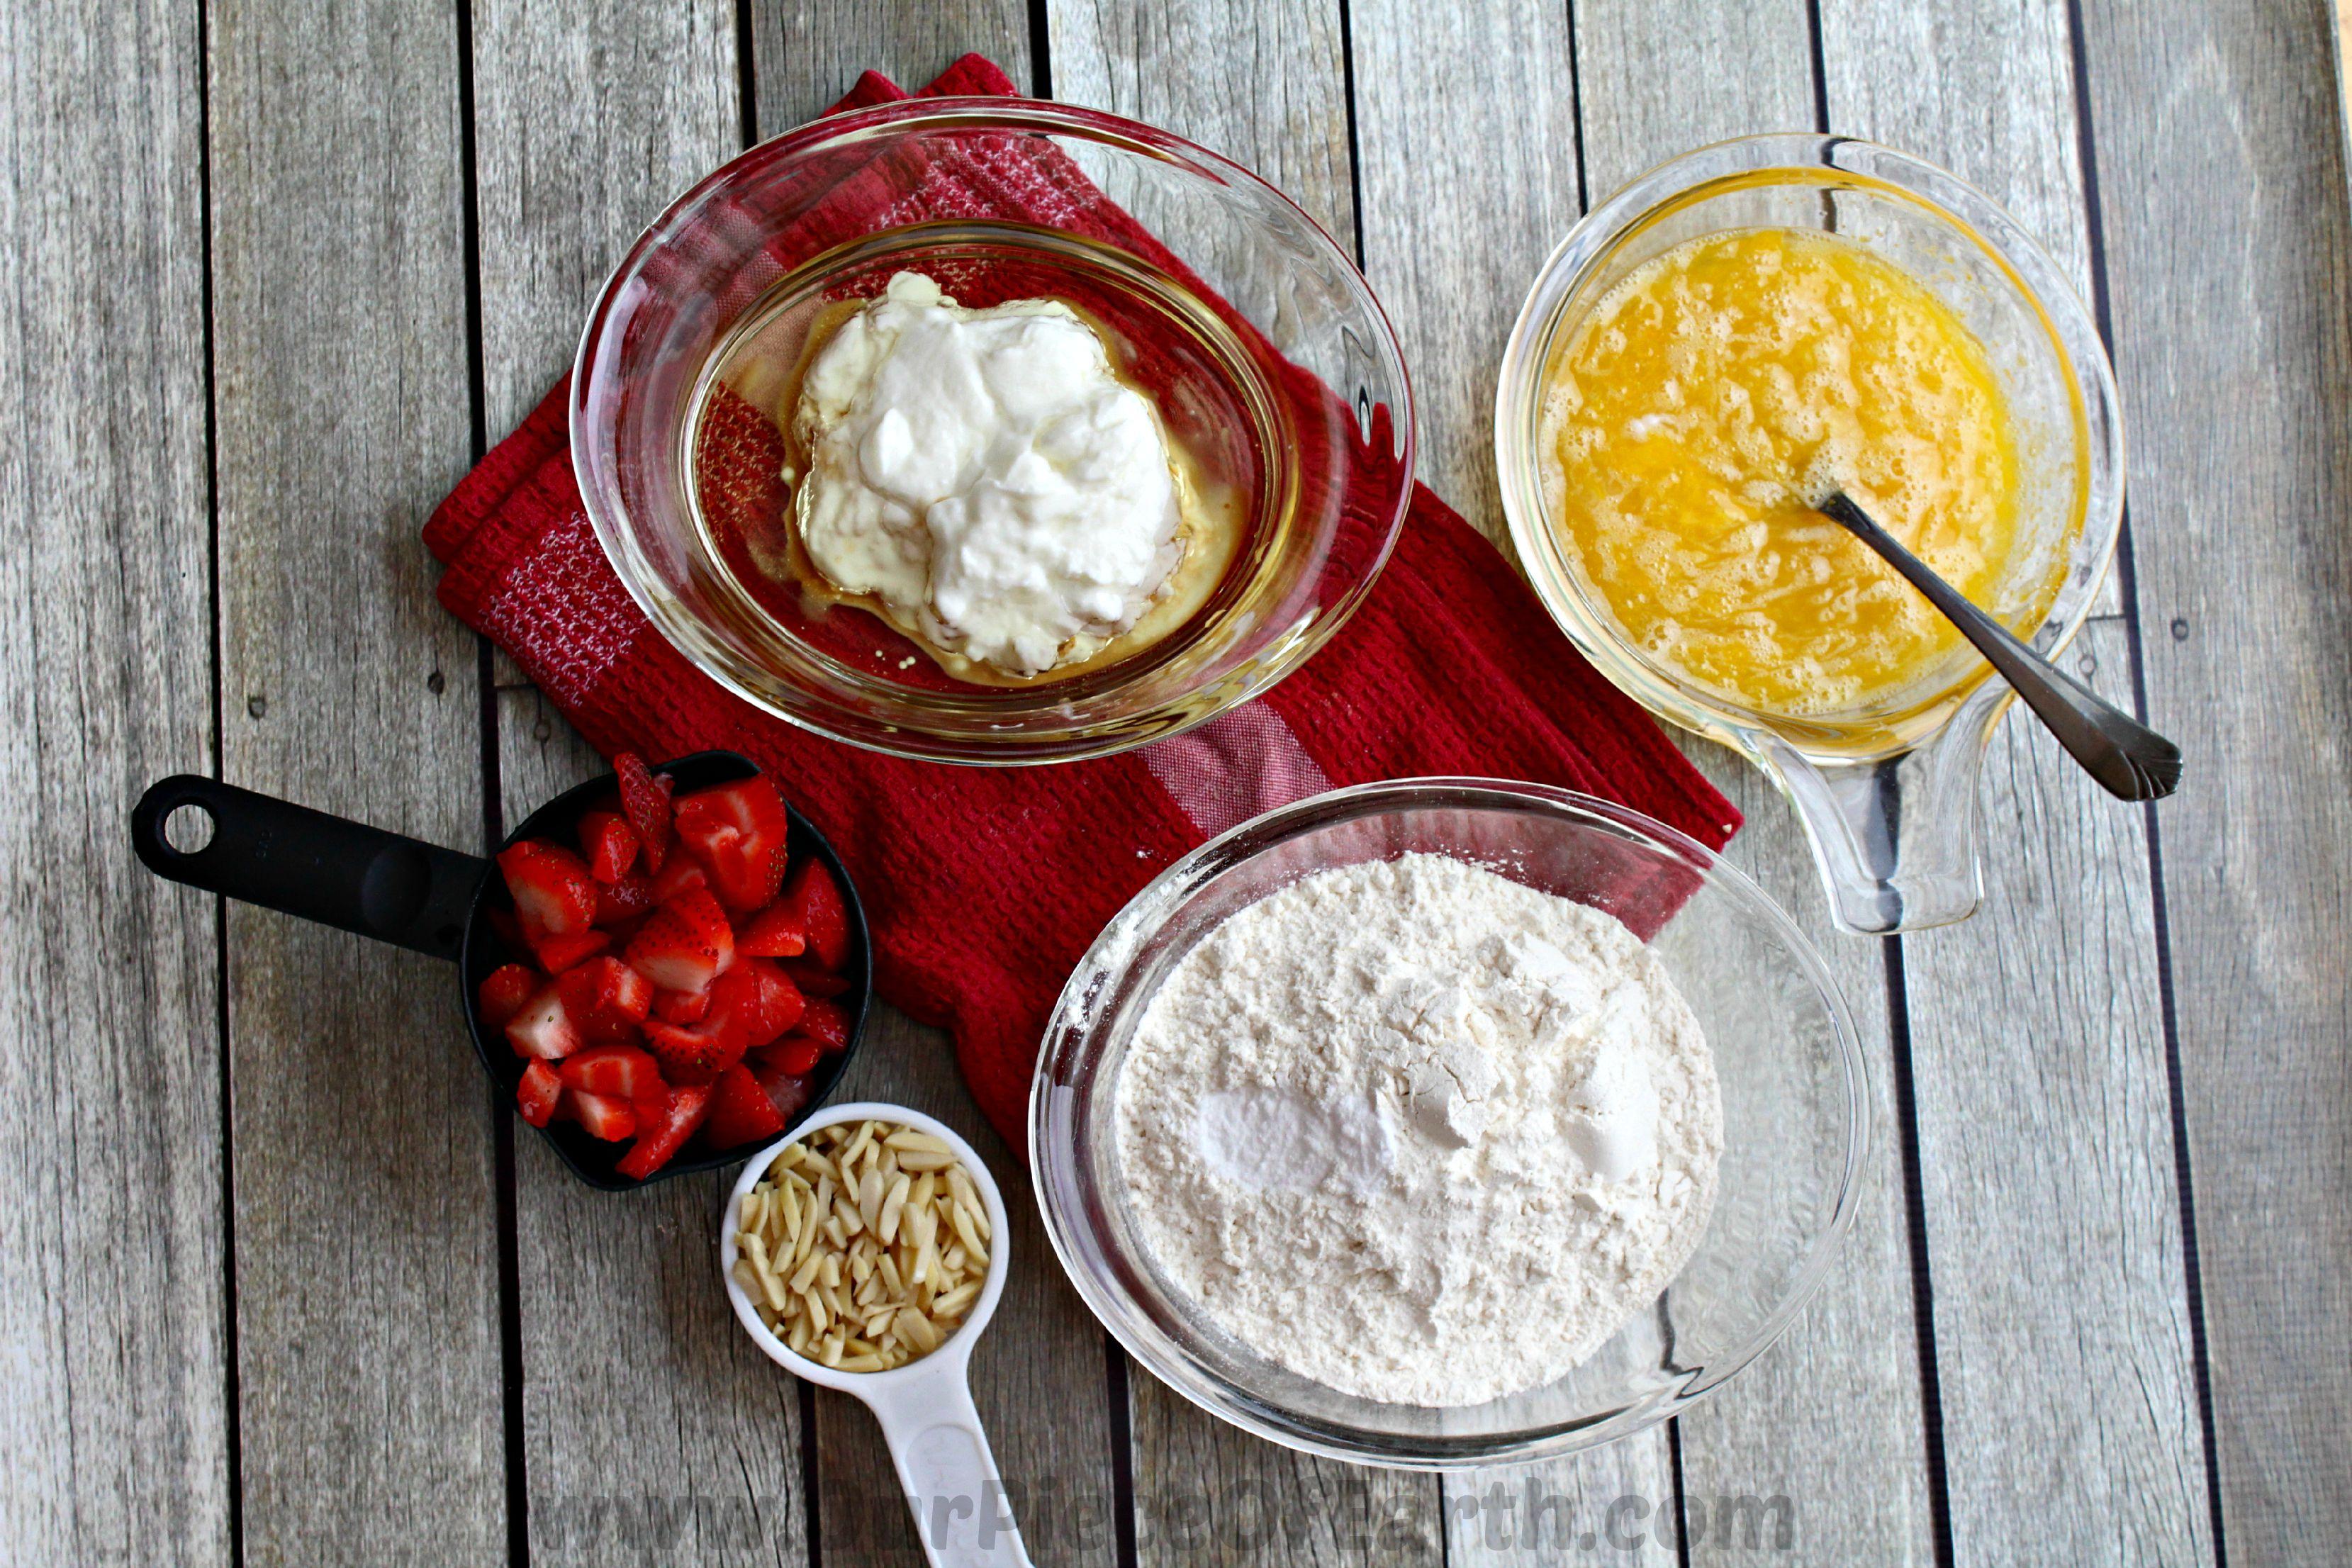 Ingredients Strawberry Almond Streusel Muffins